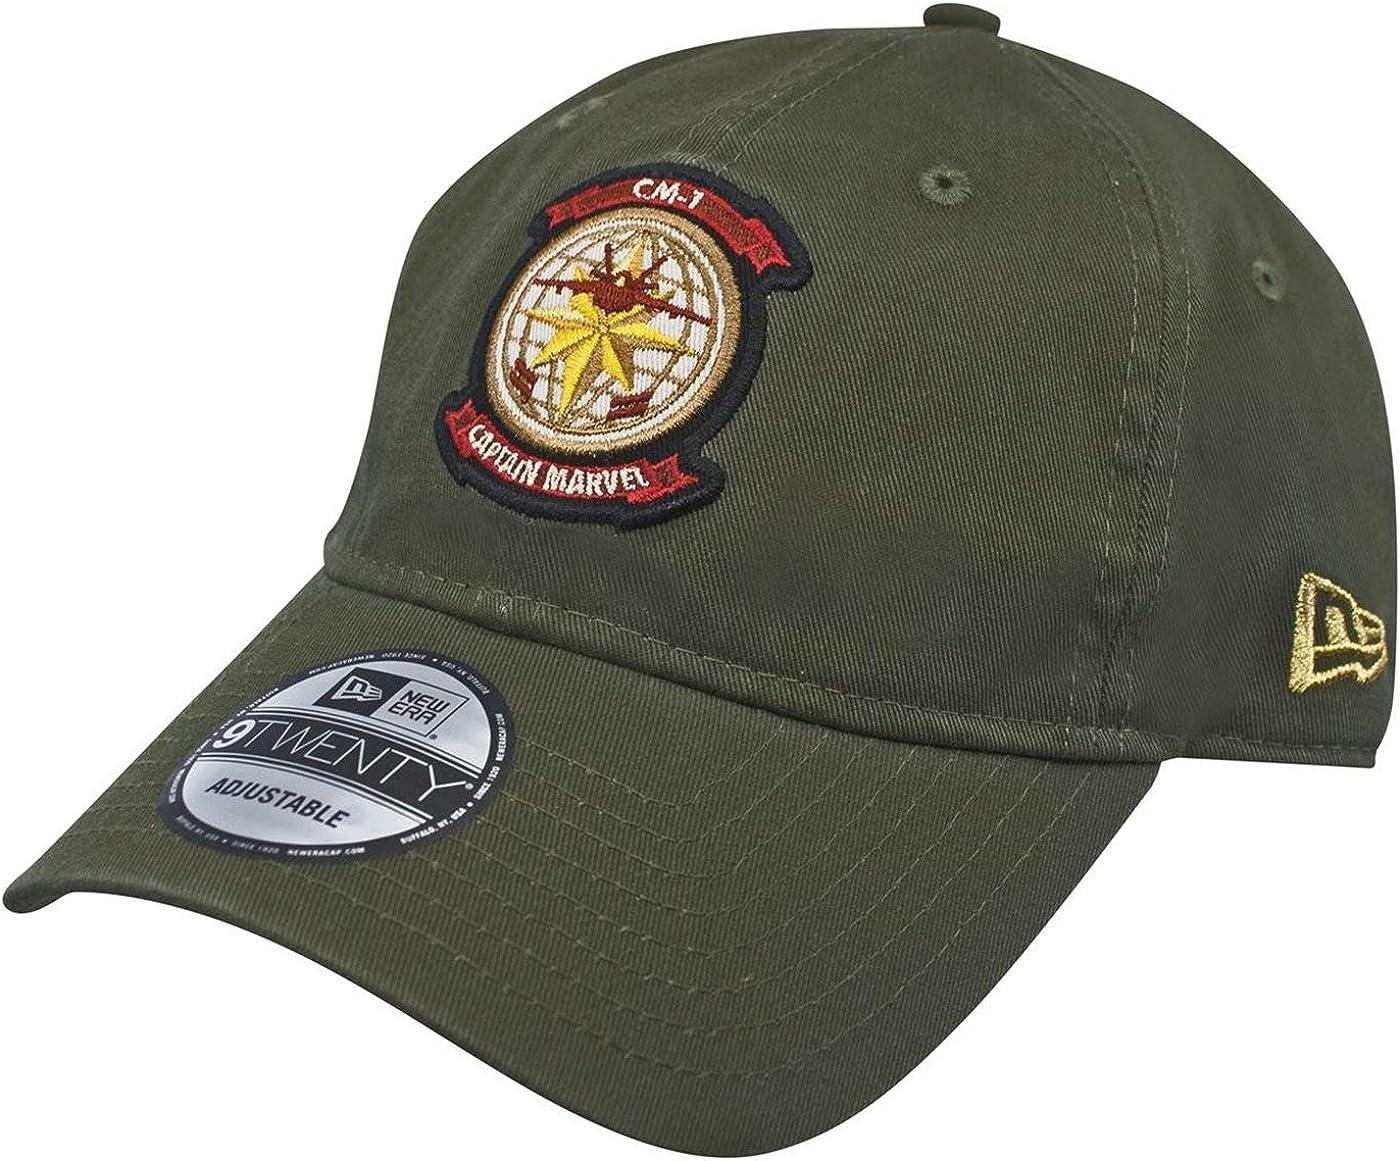 Captain Marvel Air Force Pilot 9Twenty Adjustable New Era Hat Green